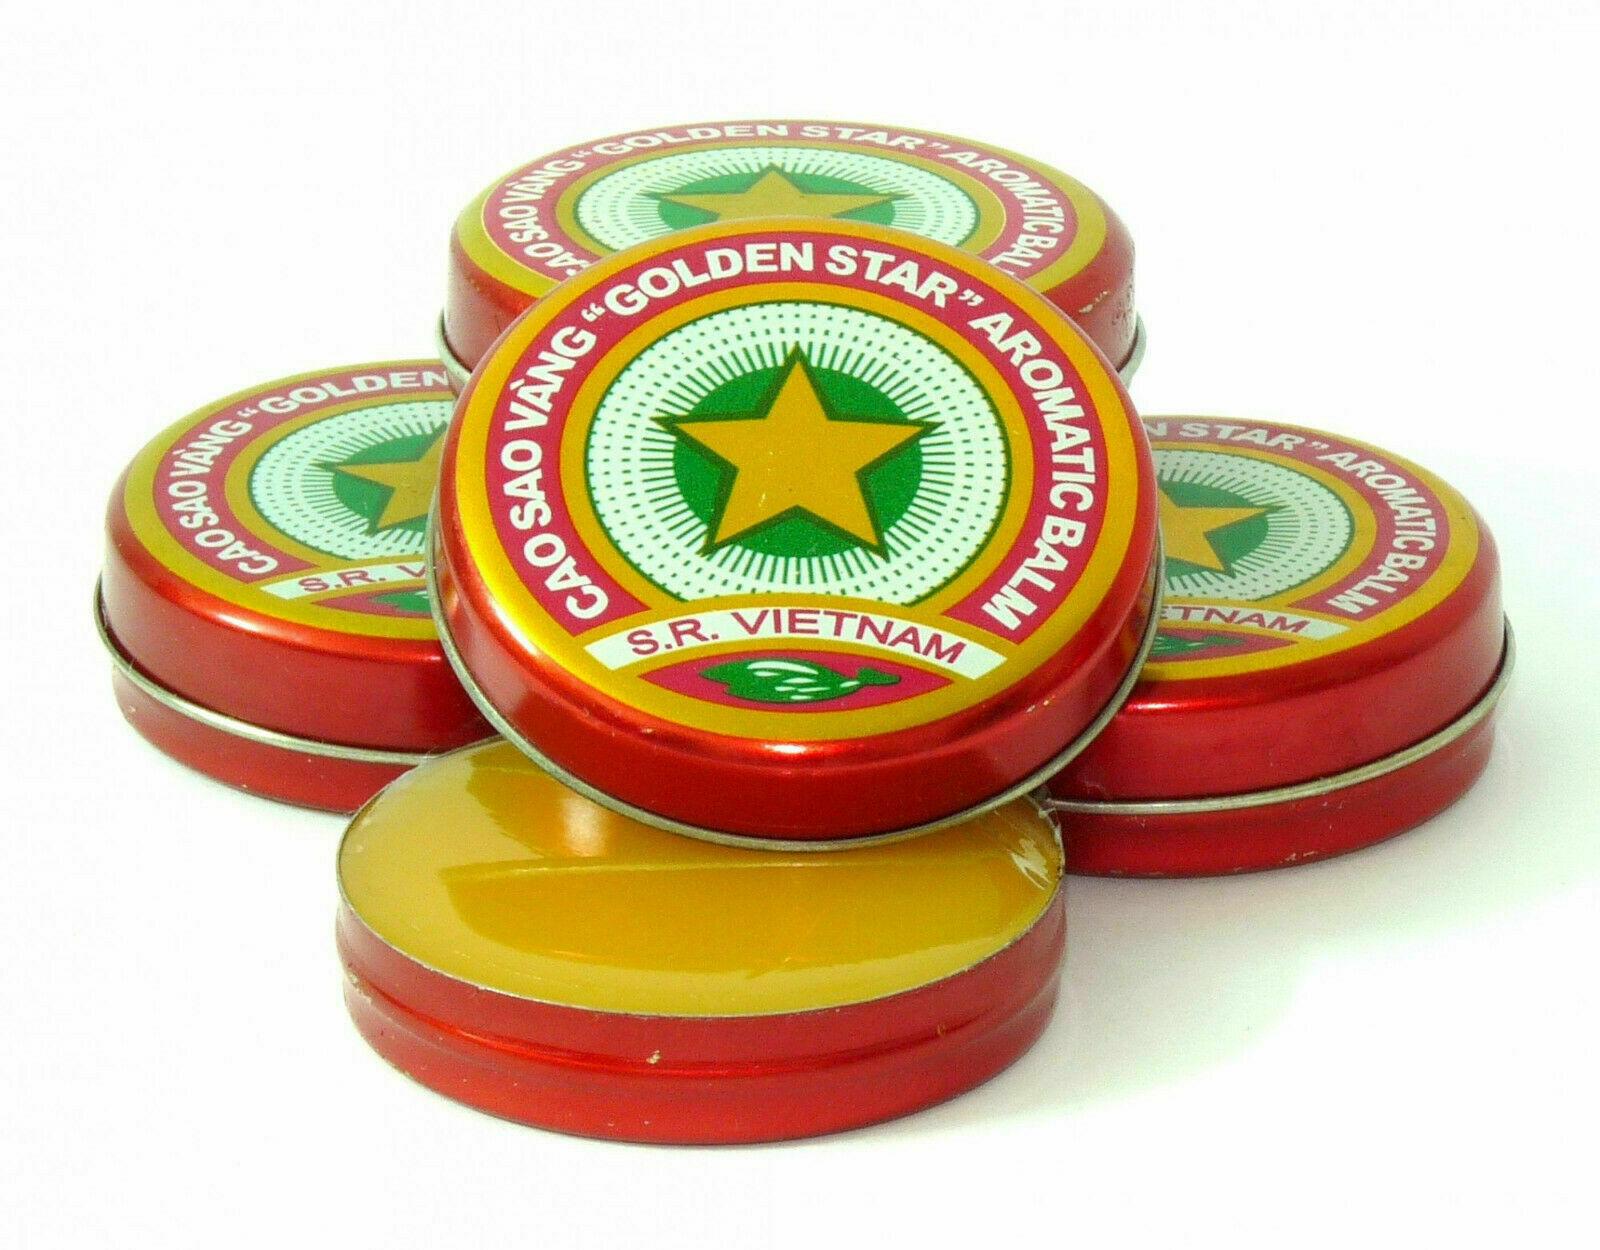 Vietnam Oil Cao Sao Vang 4g - Muscle Ache - Headache - Sinus relief (Pack of 5 )